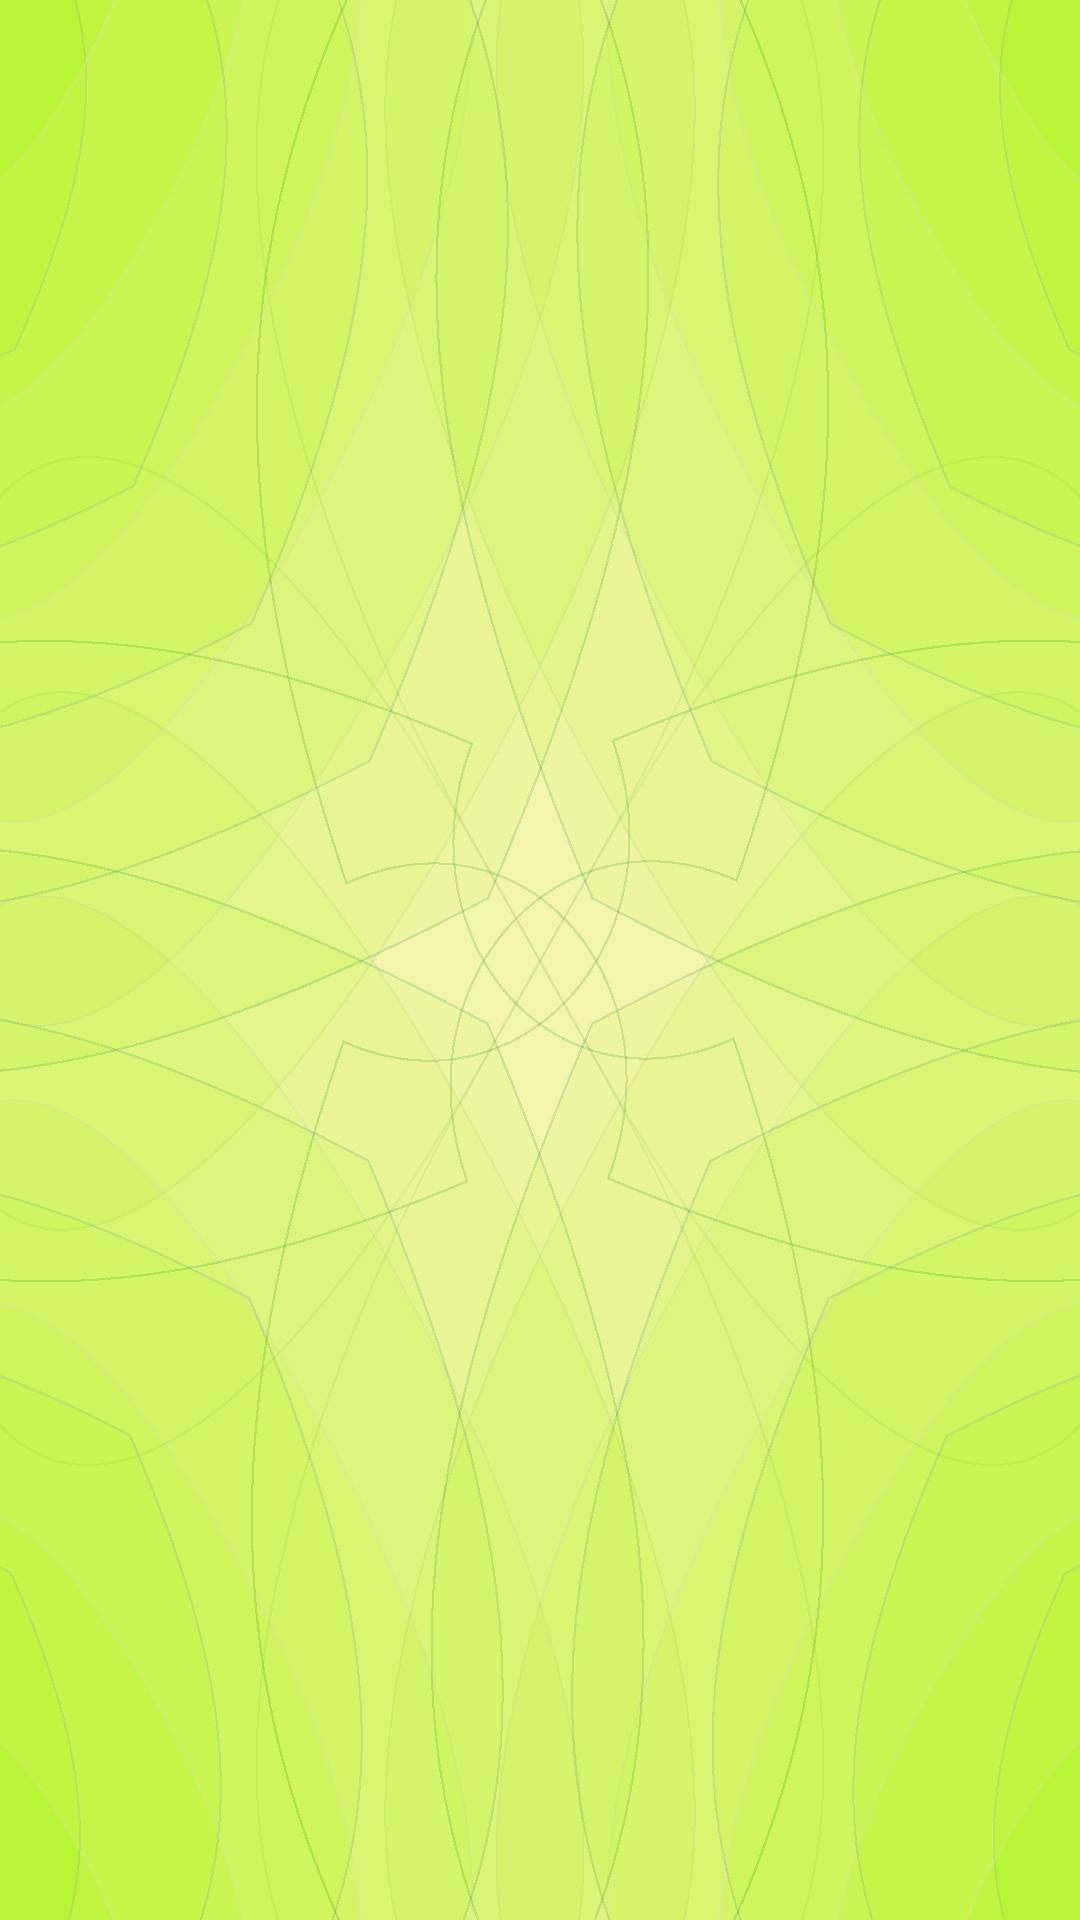 Wallpaper iphone kuning - Pola Gradasi Kuning Hijau Iphone6s Plus Iphone6 Plus Wallpaper